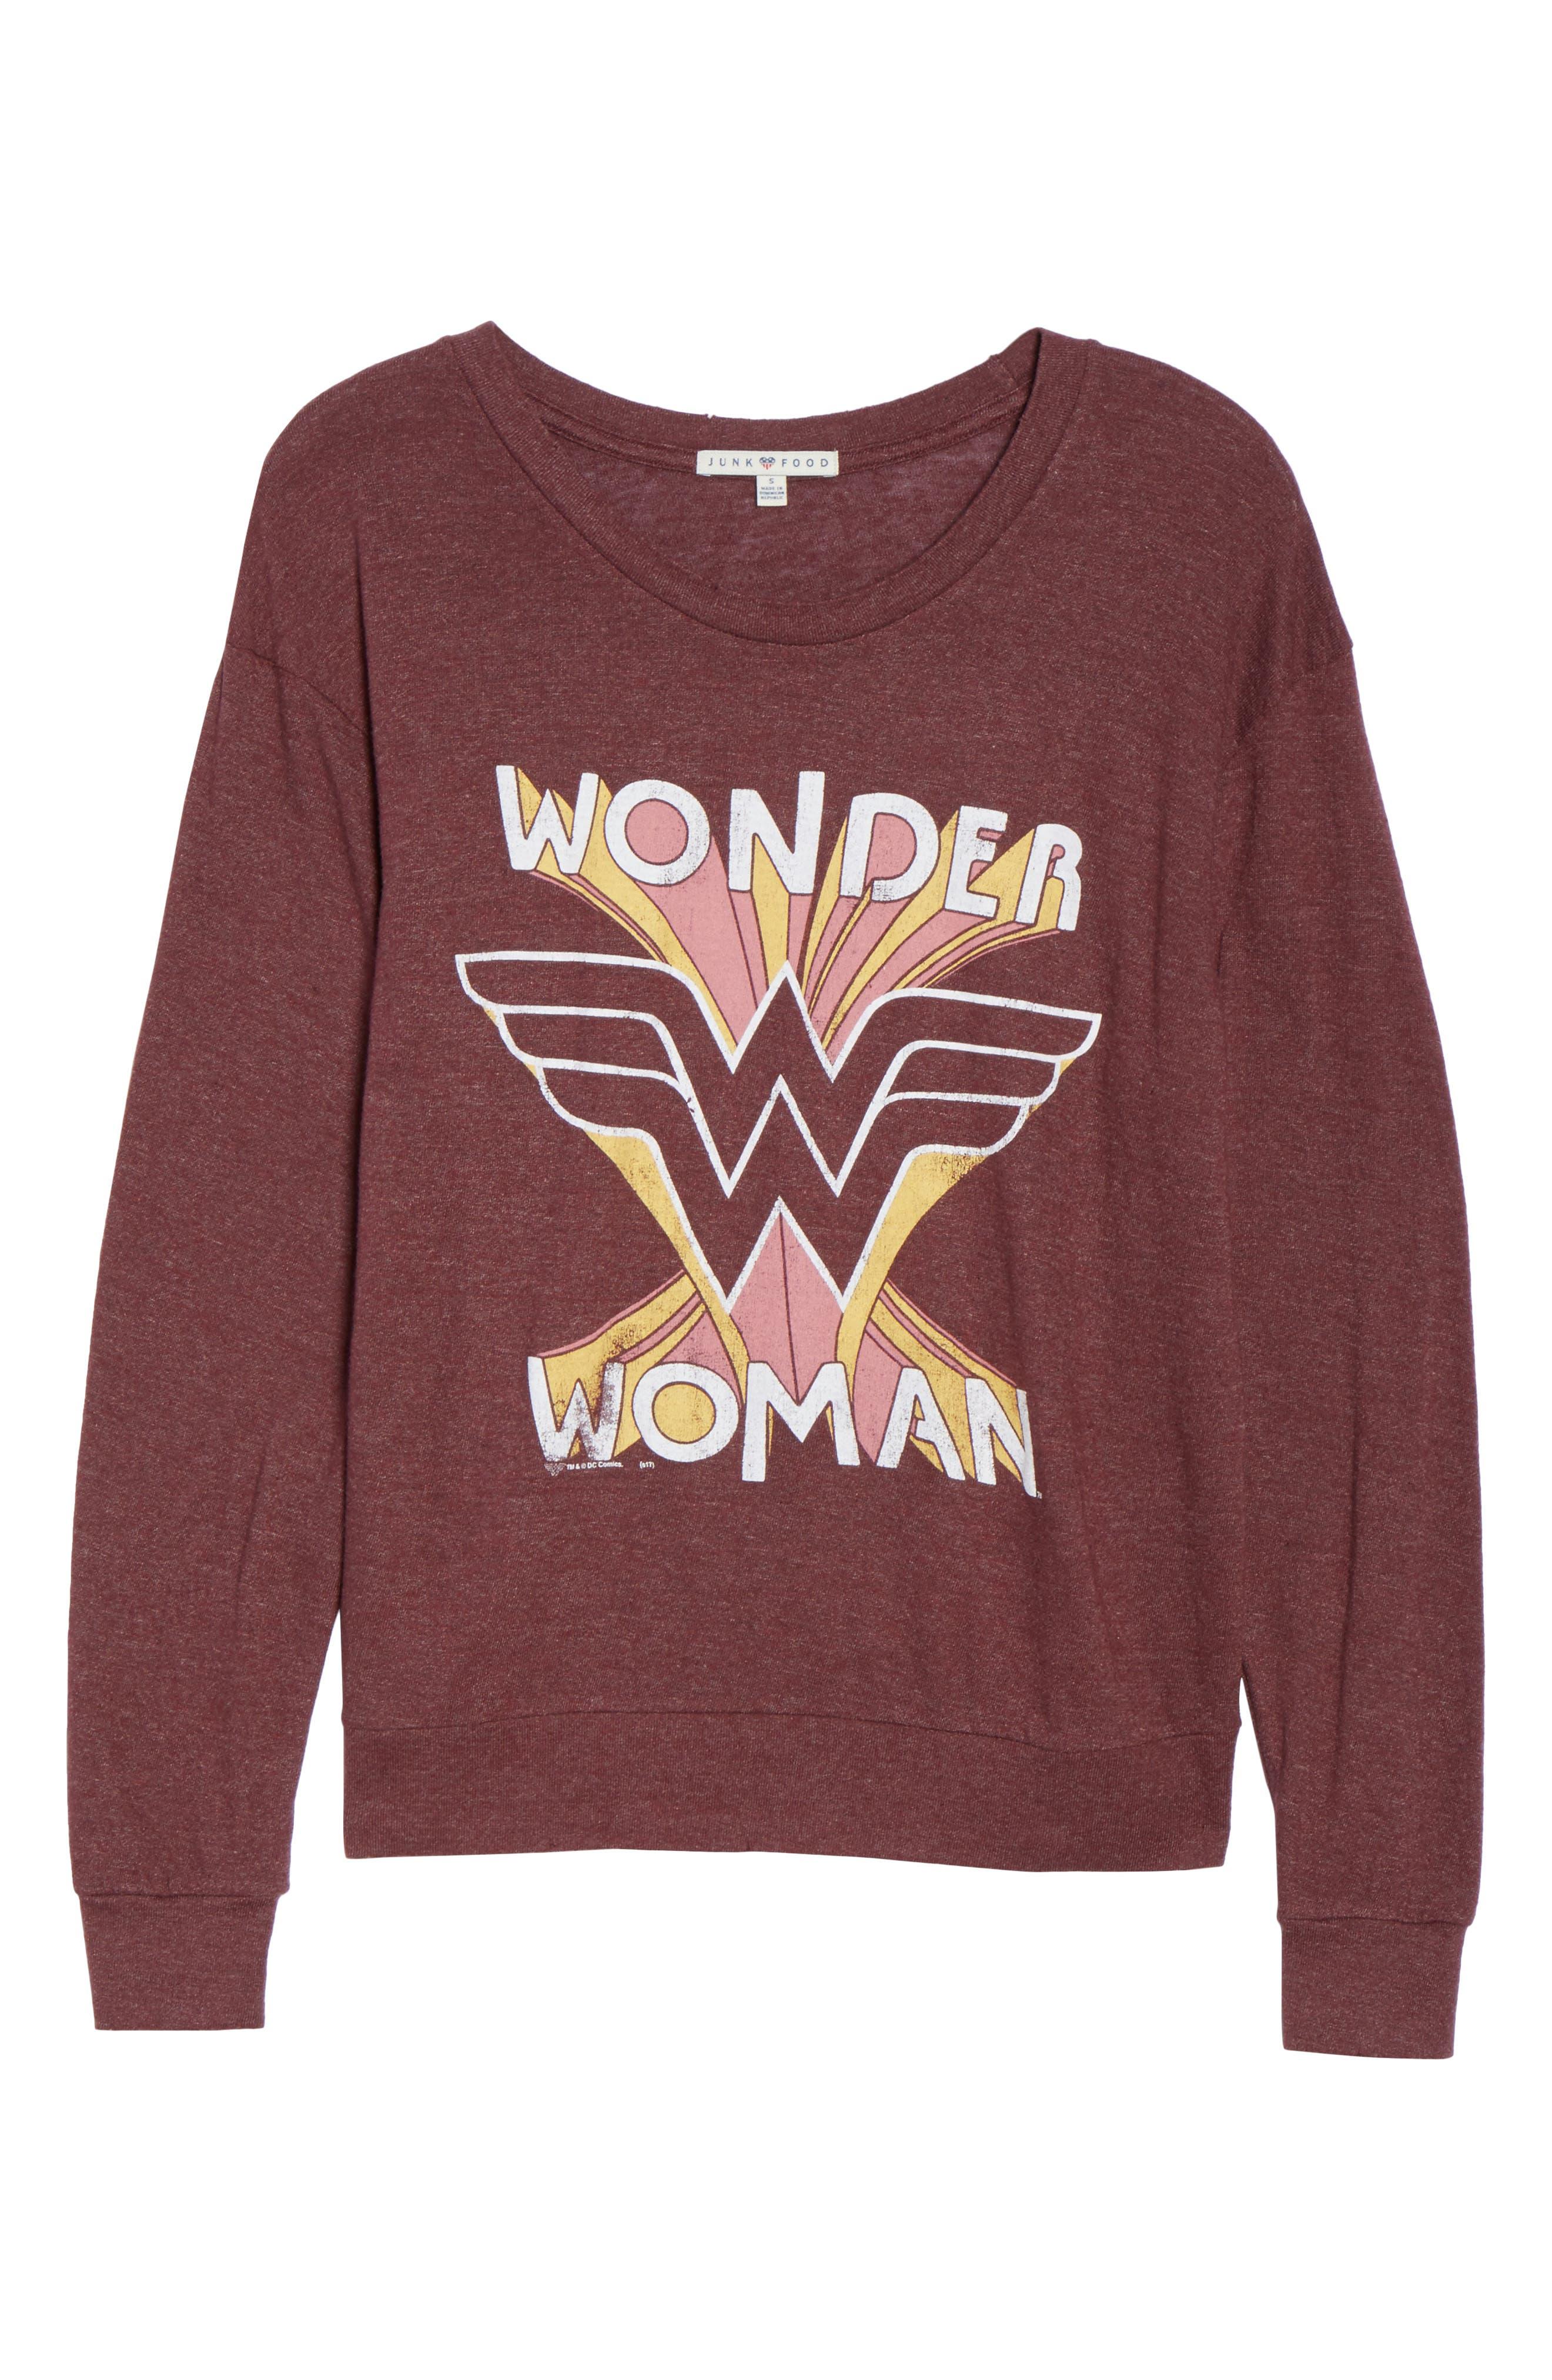 Wonder Woman Sweatshirt,                             Alternate thumbnail 4, color,                             Saint